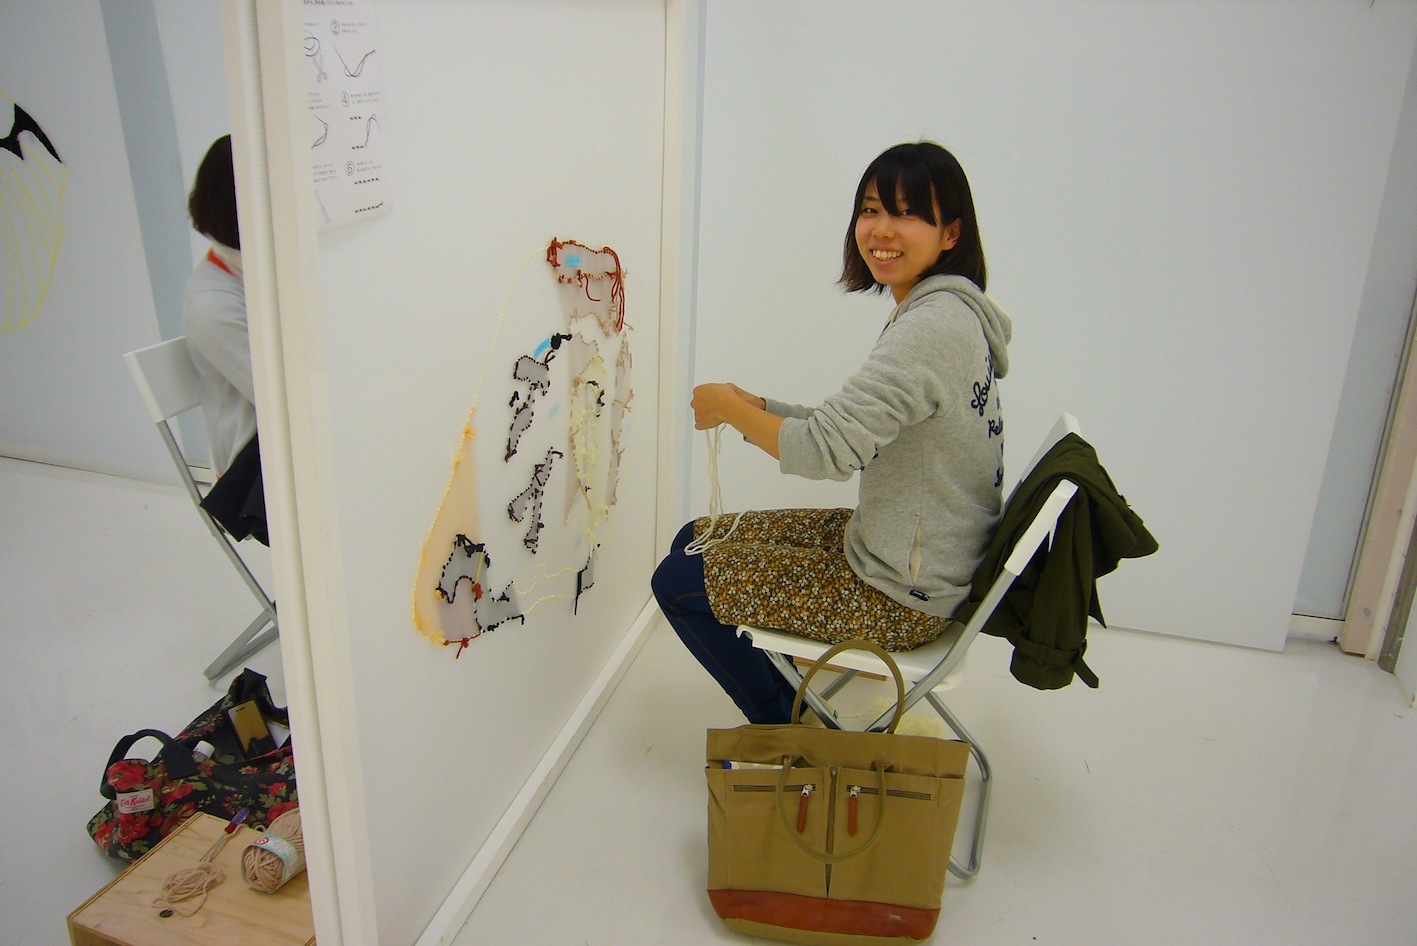 http://blog.3331.jp/staff/file/P1030558.JPG